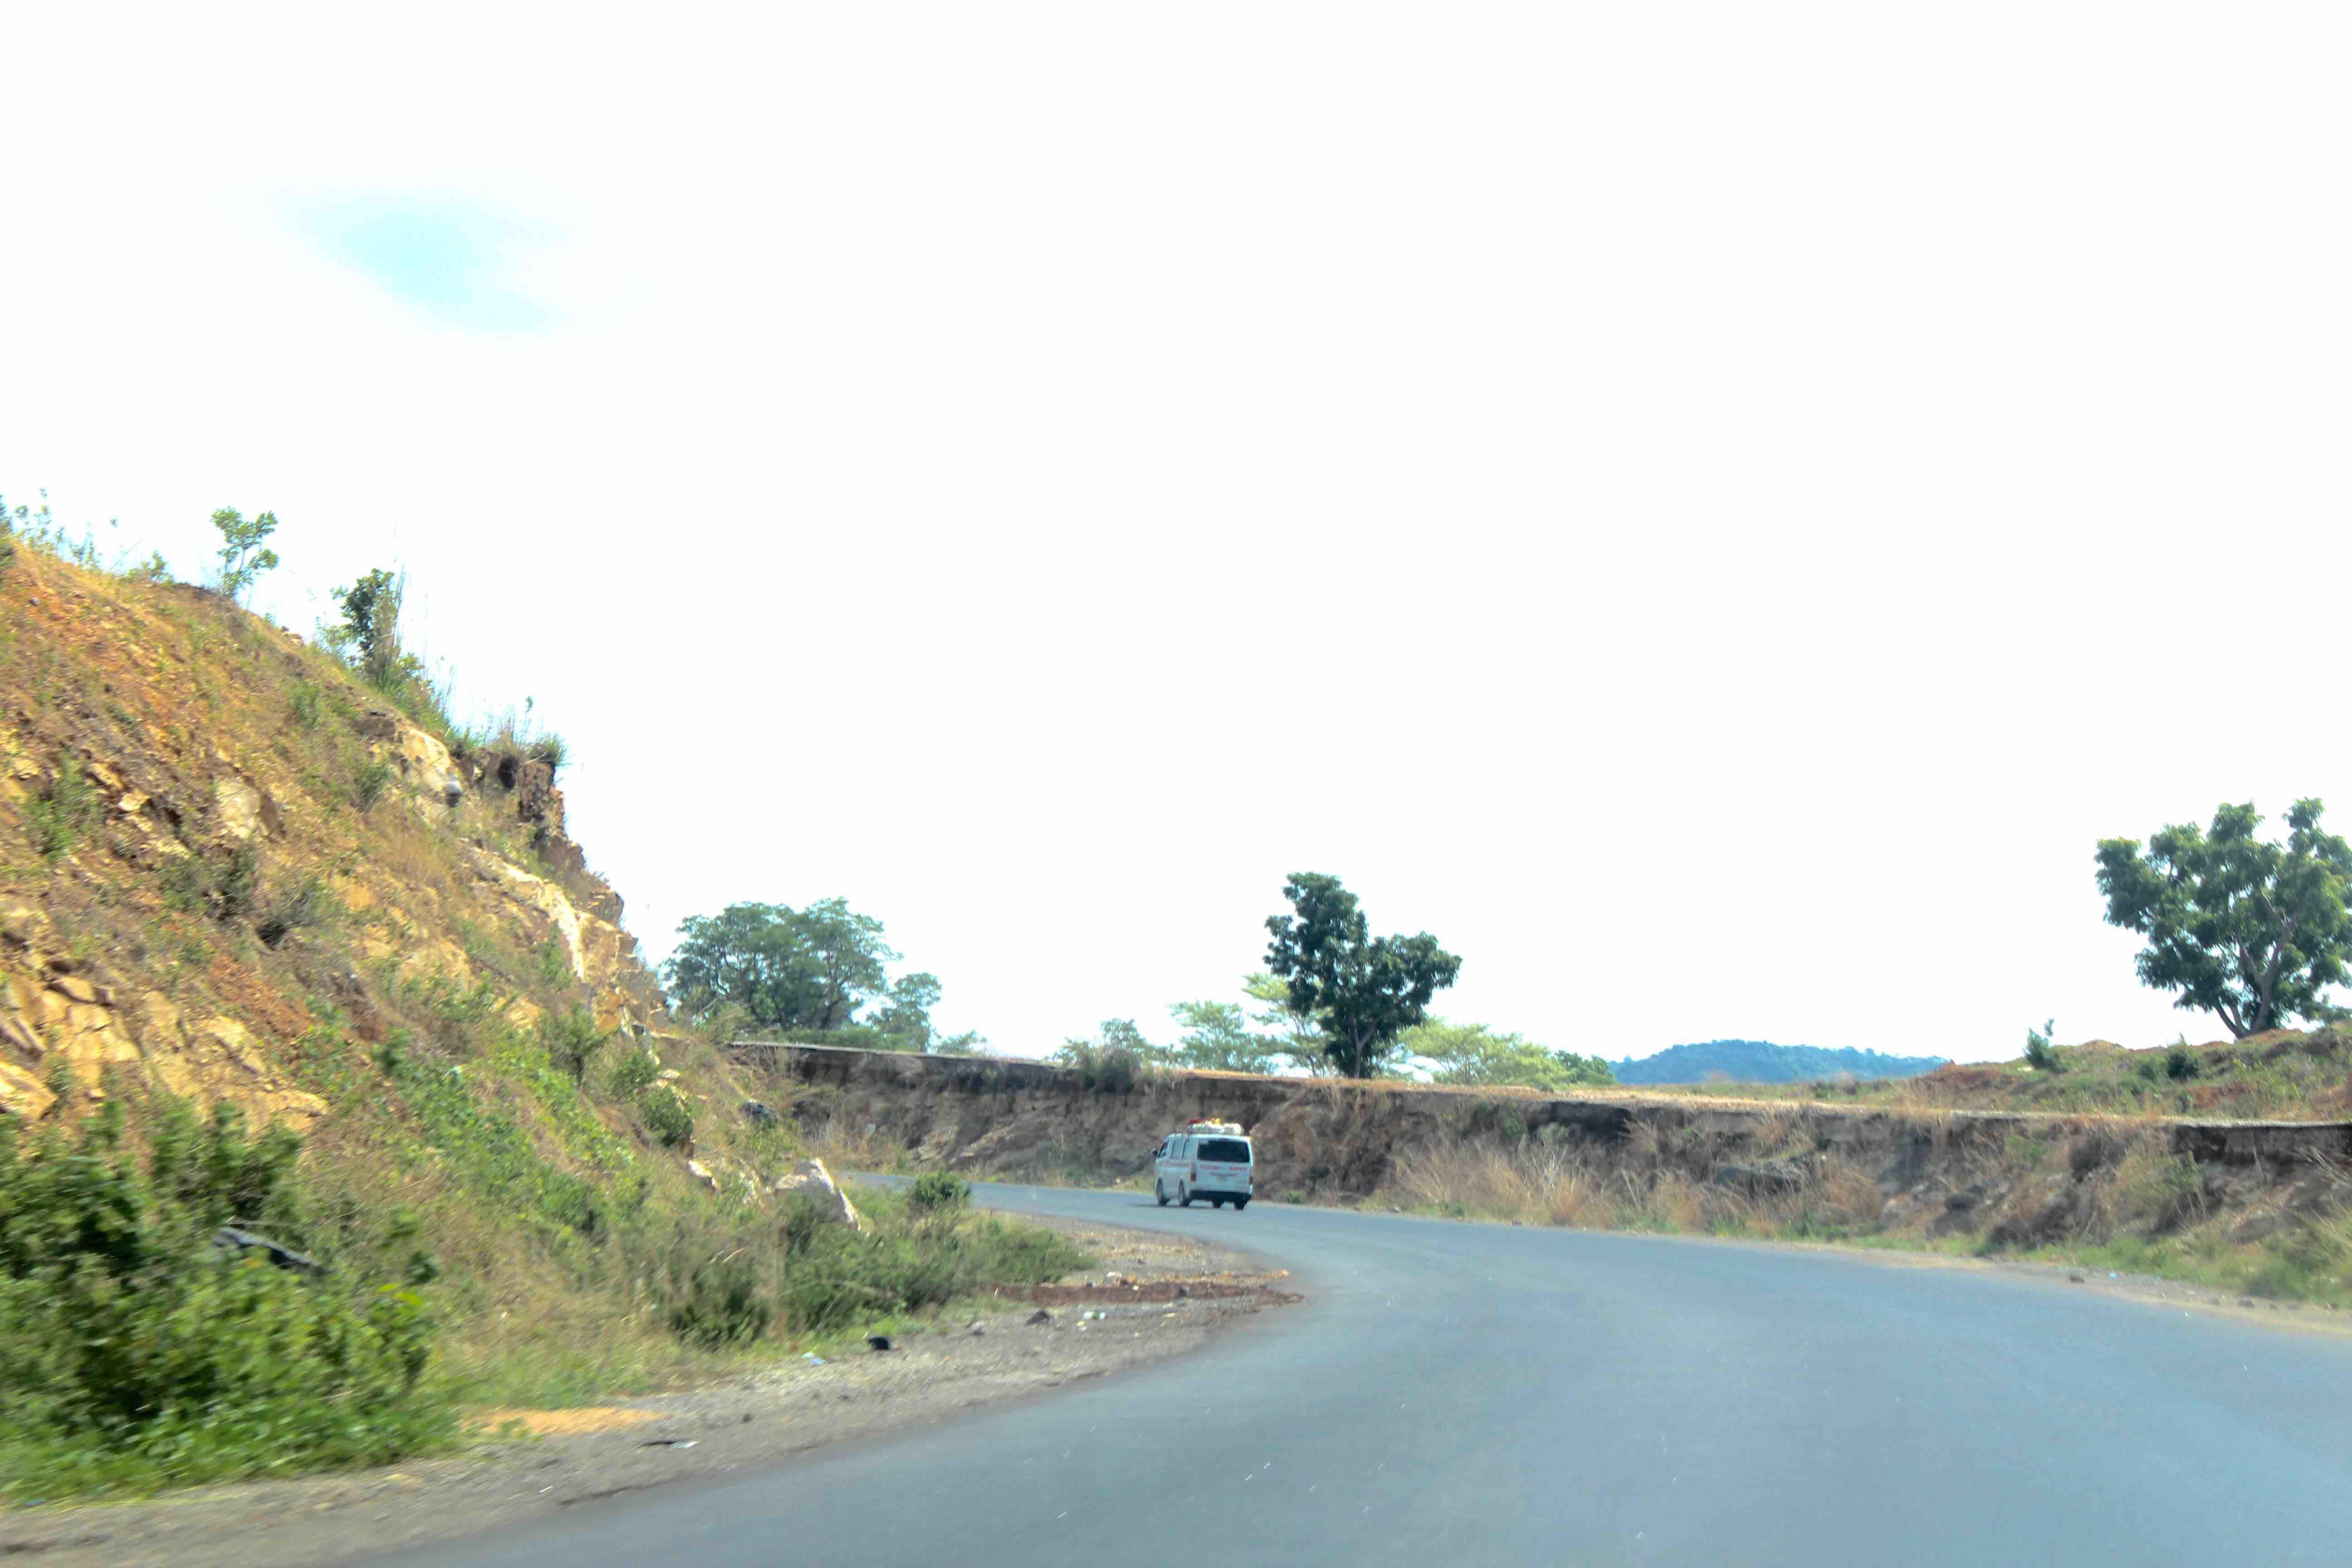 Makurdi to Abuja Highway, Benue State, Nigeria. #JujuFilms